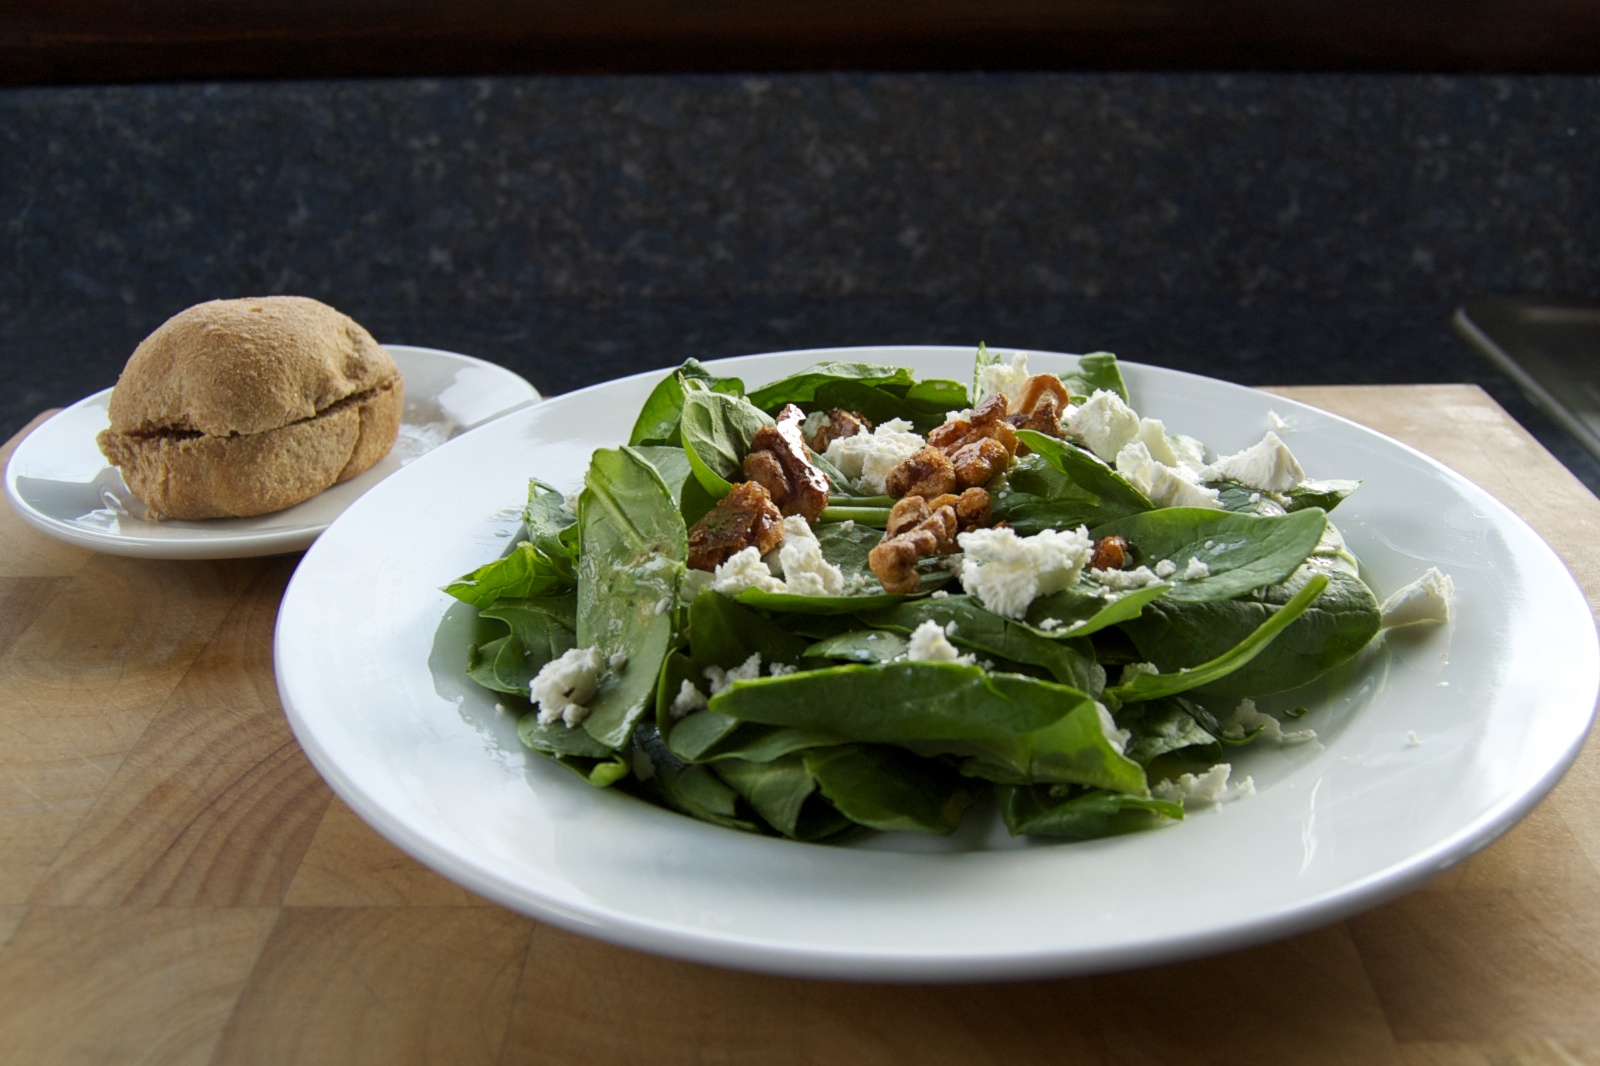 http://blog.rickk.com/food/2012/04/16/ate.2012.04.16.l.jpg